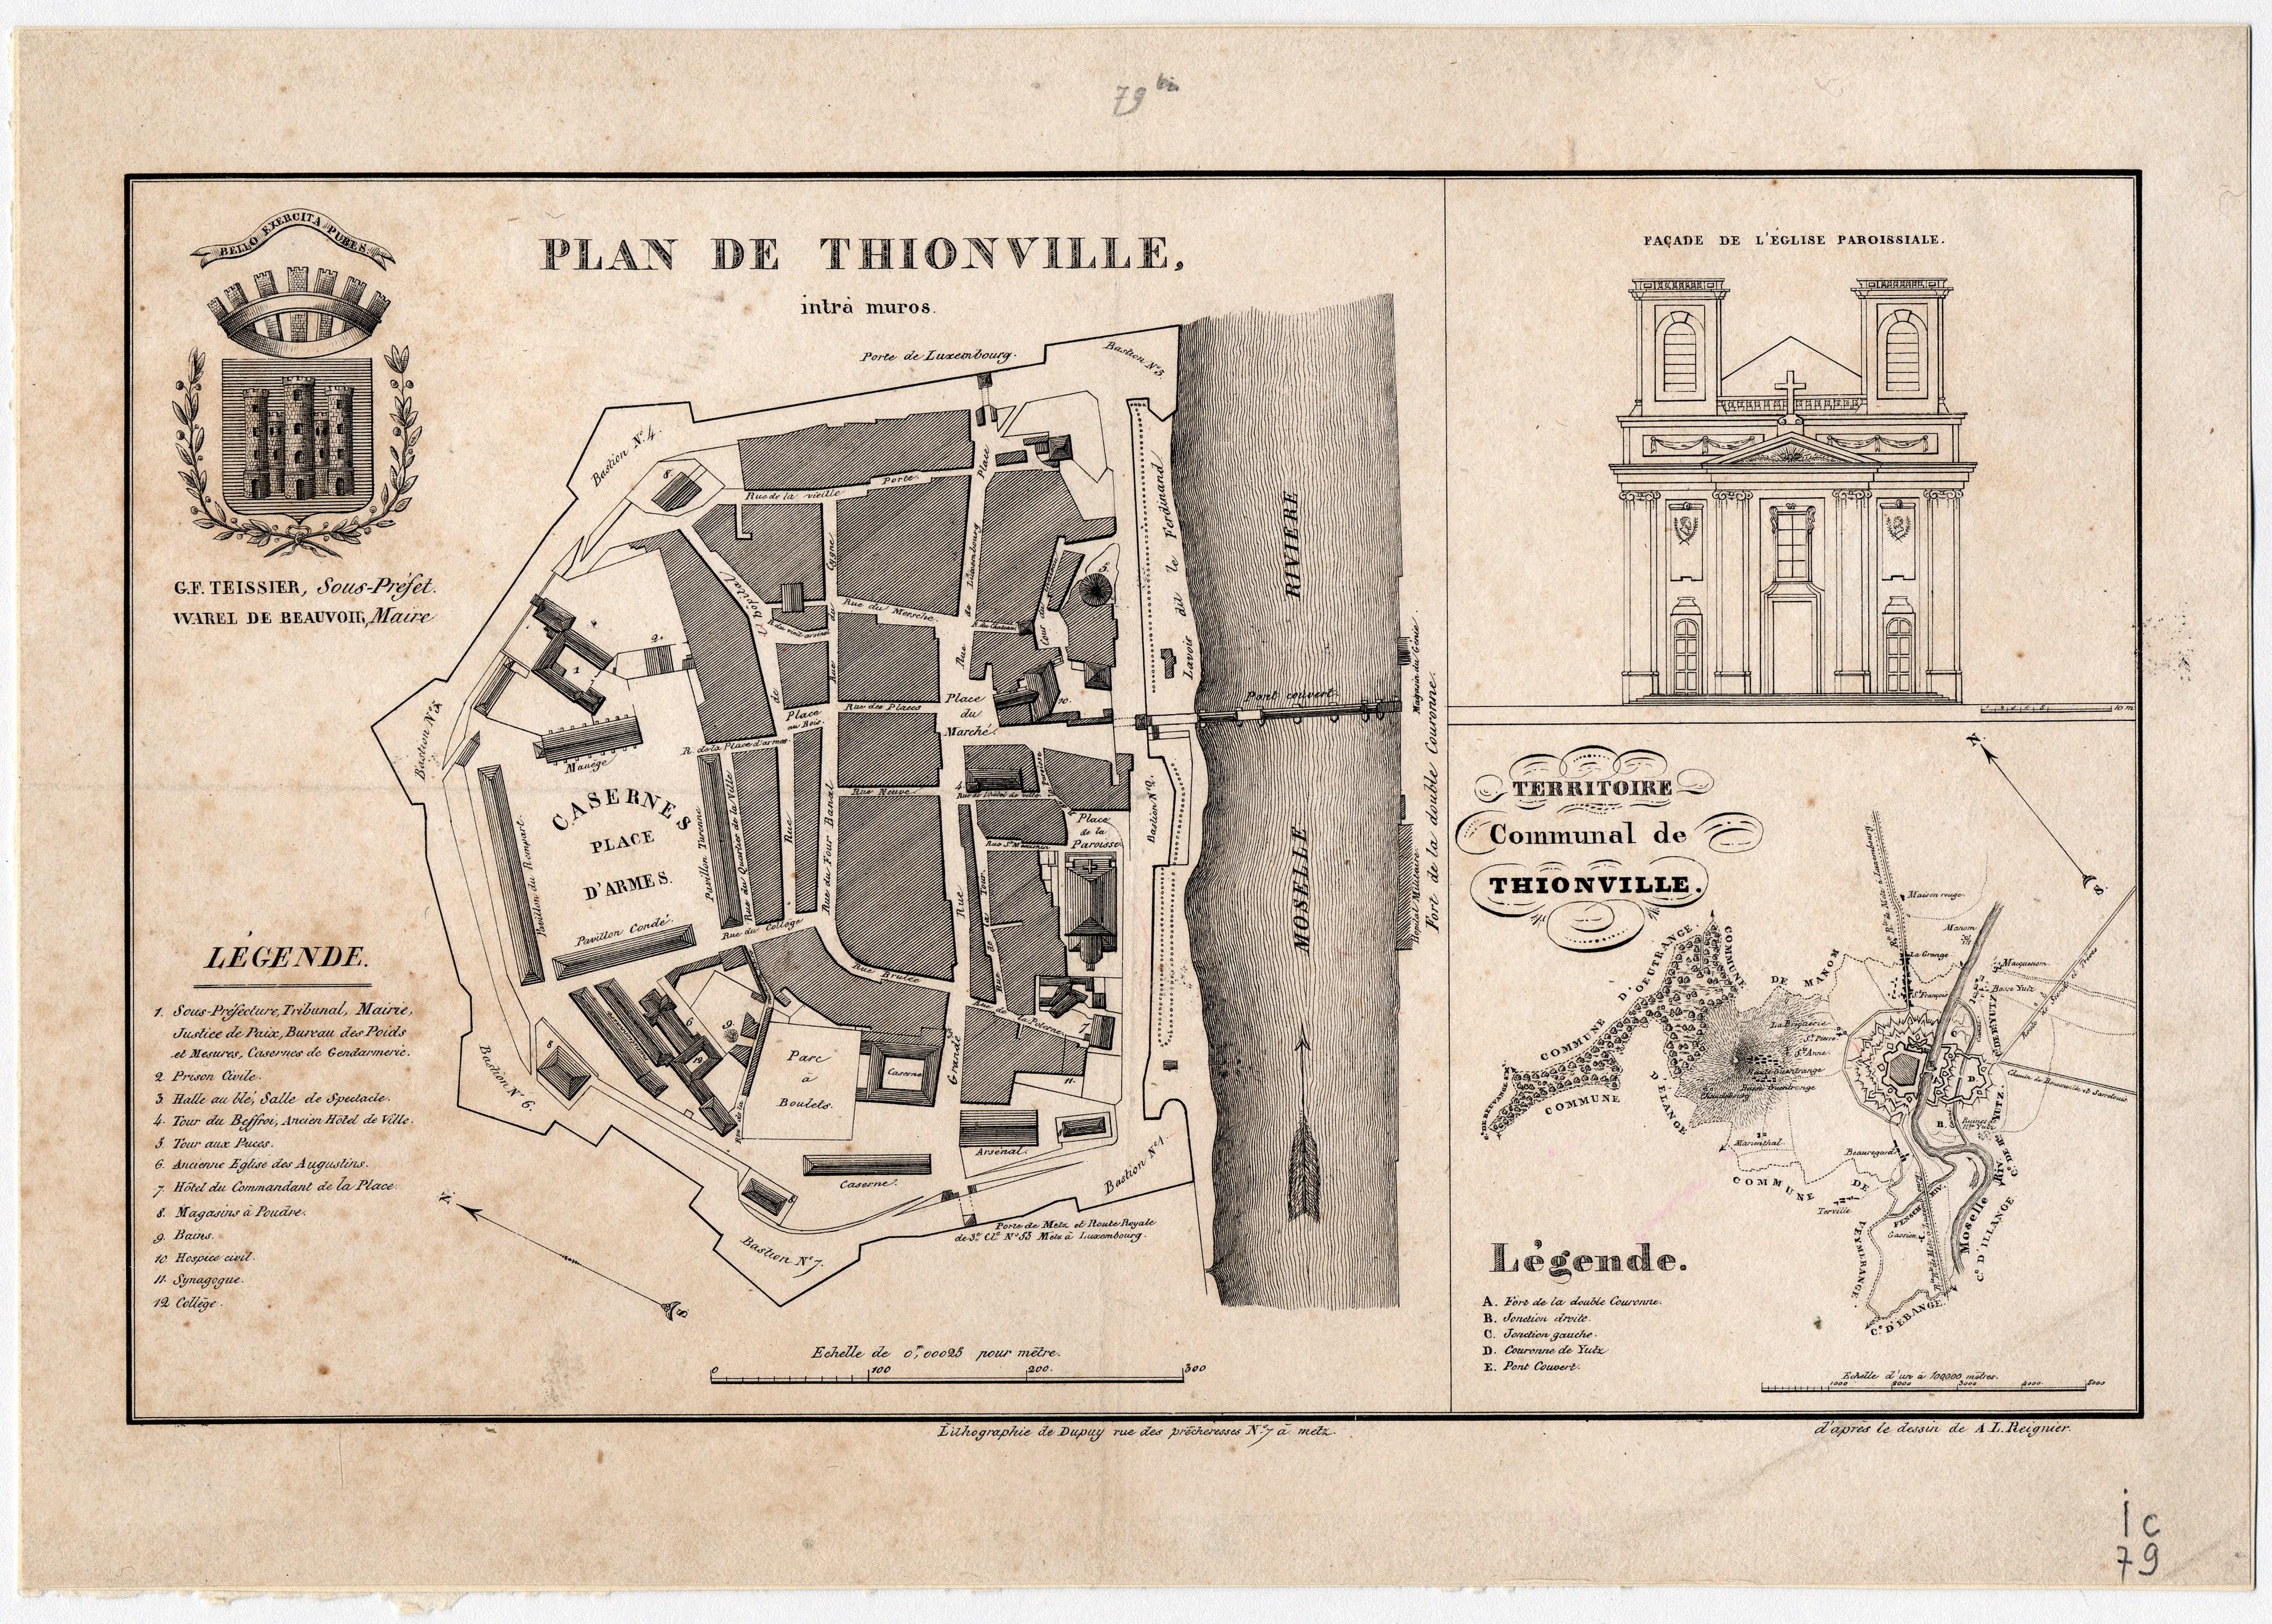 Contenu du Plan de Thionville intra muros